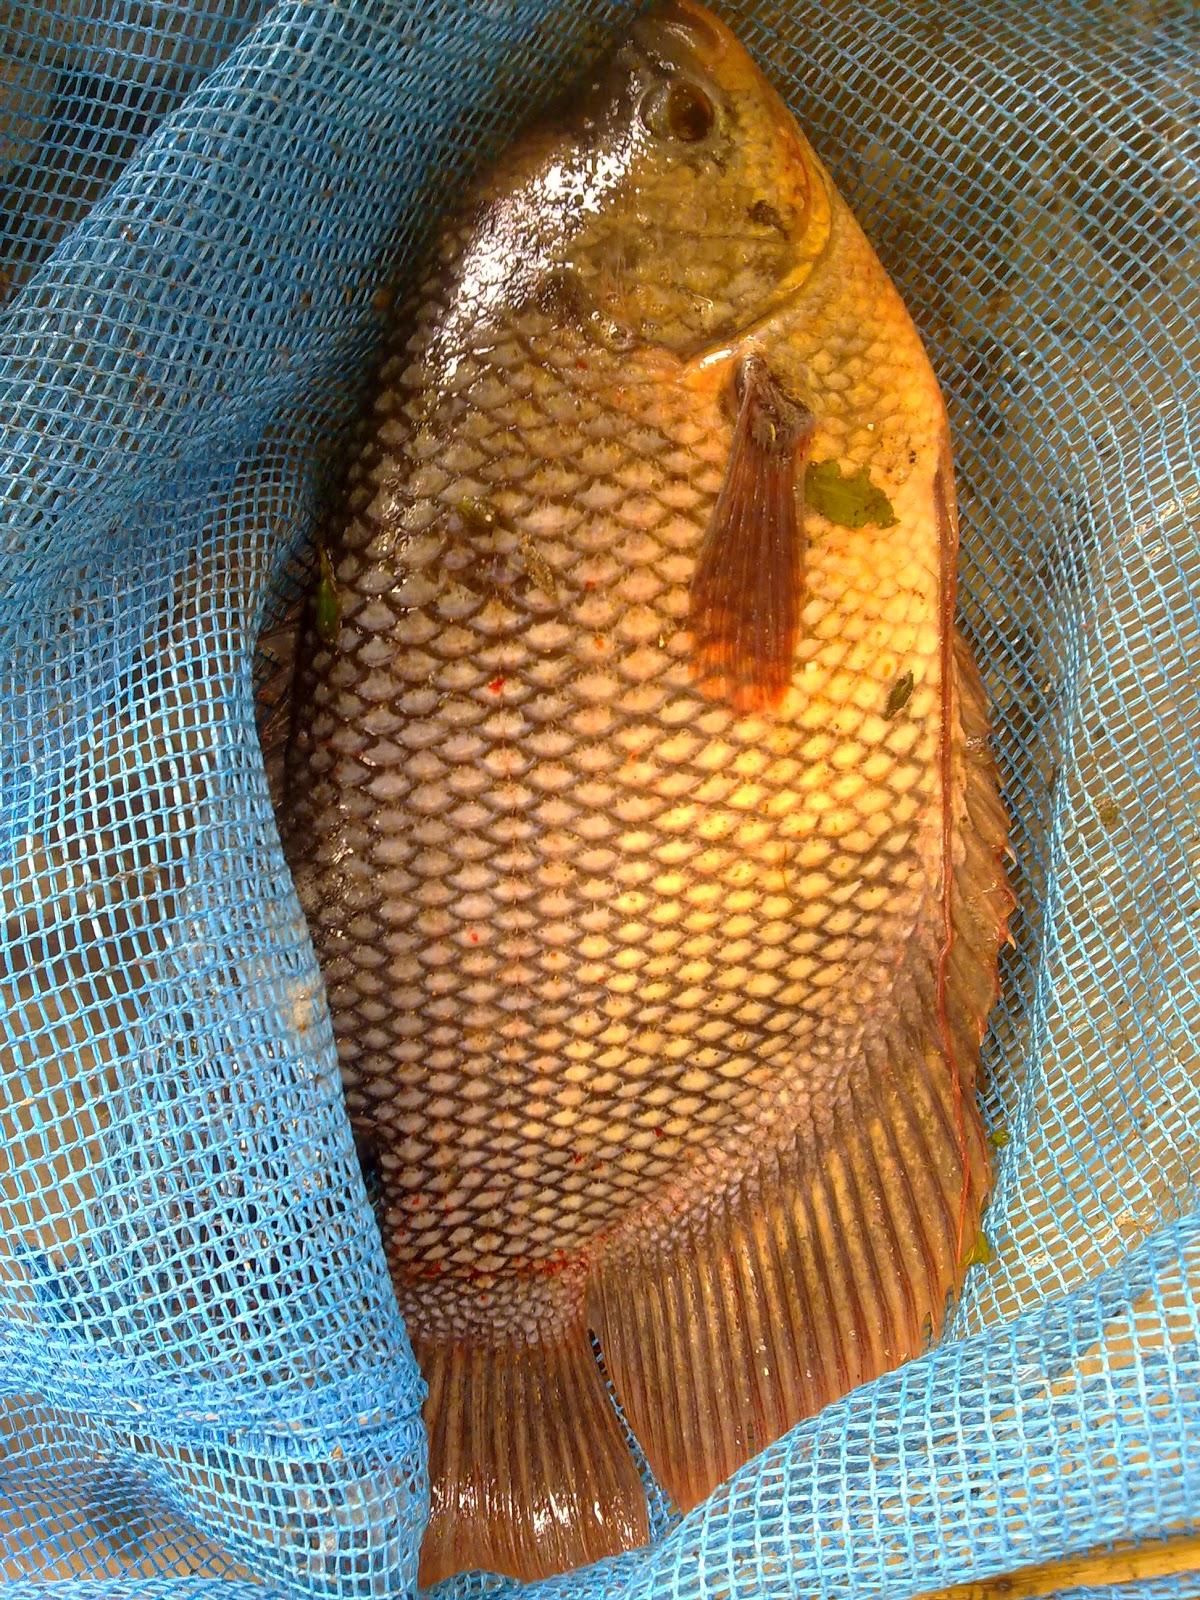 Indonesia Tourism Cara Jitu Atasi Penyakit Ikan Gurame